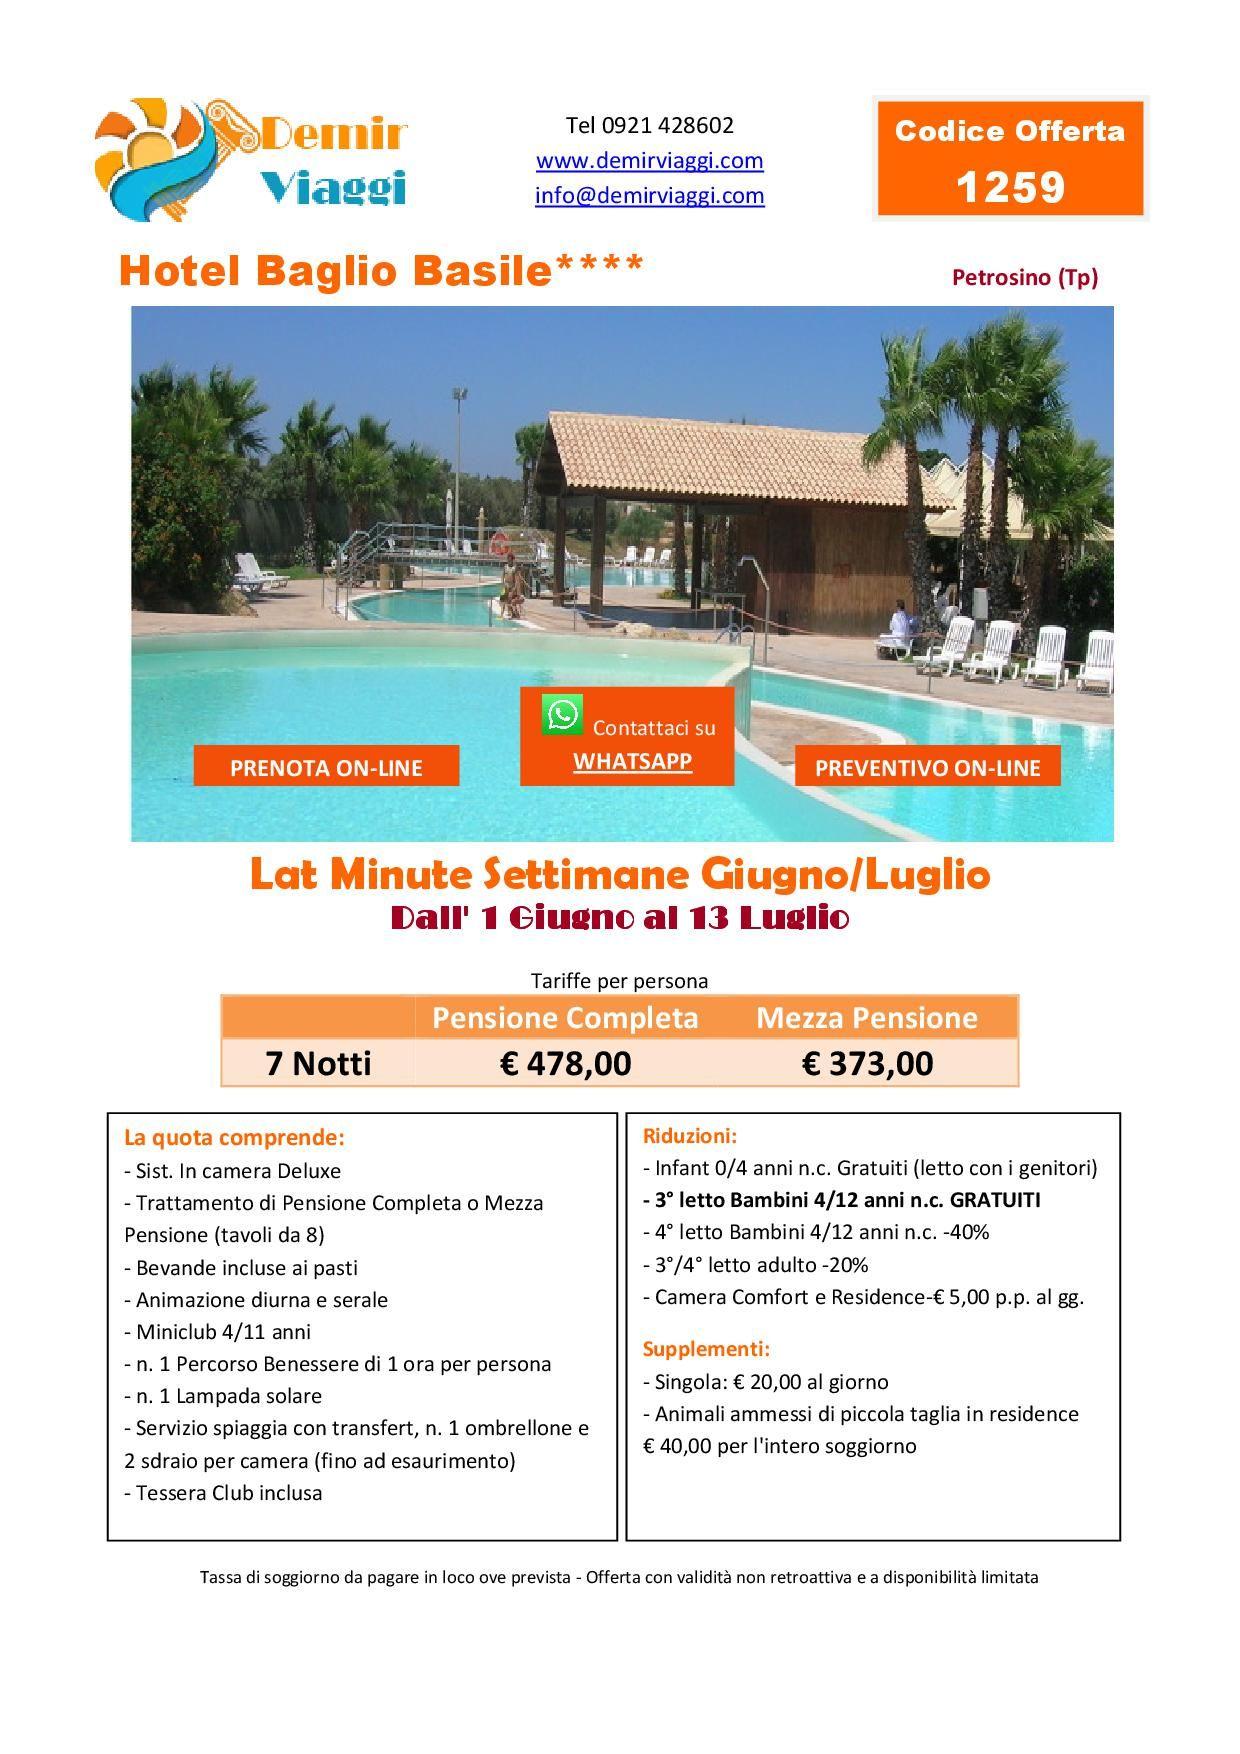 Hotel Baglio Basile**** - Petrosino (Tp) Last Minute Settimane ...